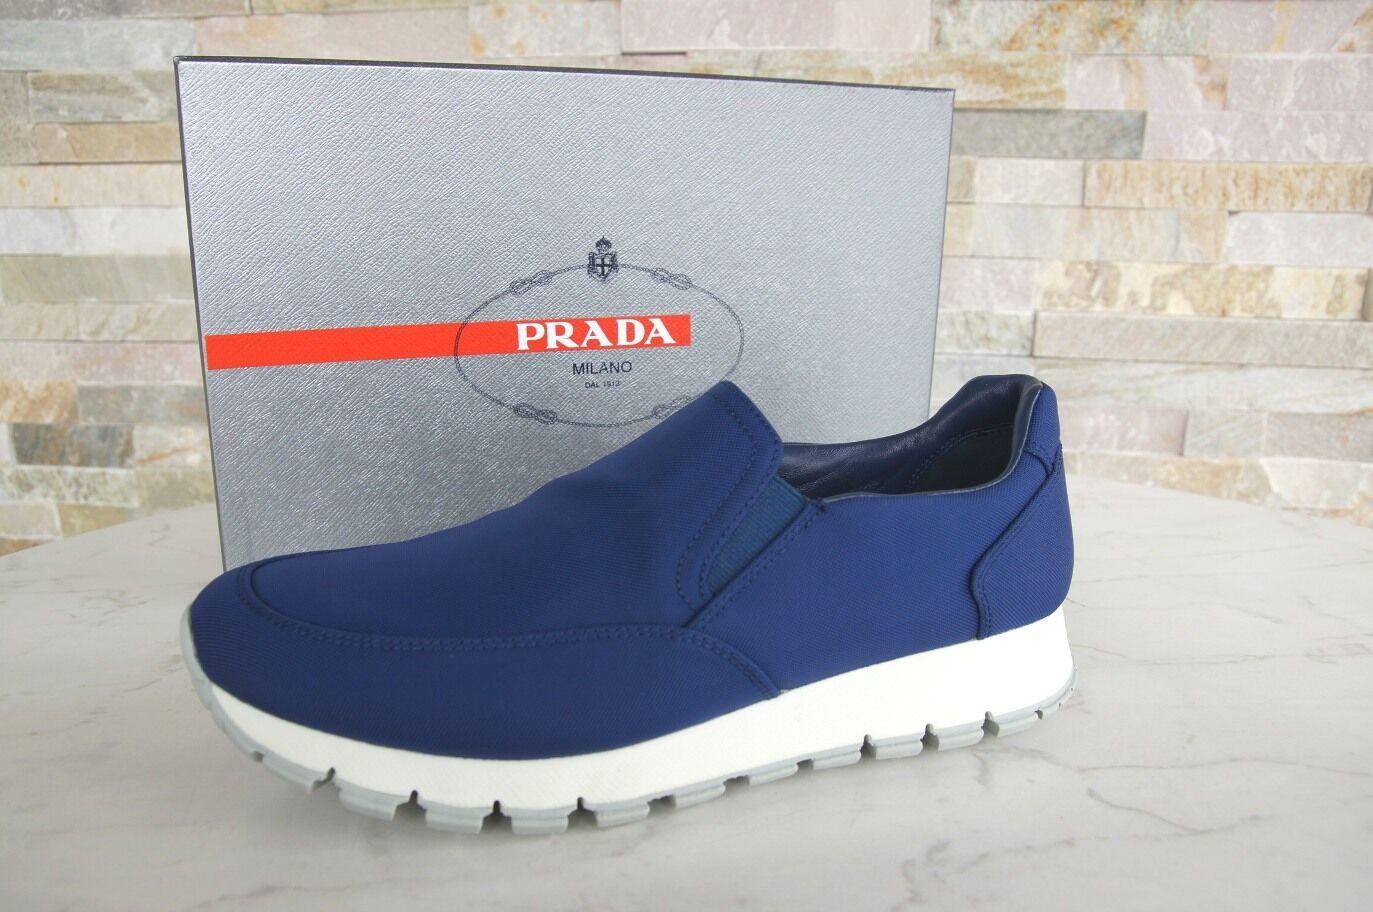 Luxus PRADA Gr 40 Slipper Turnschuhe Slip On Schuhe 3S5947 blau NEU ehem